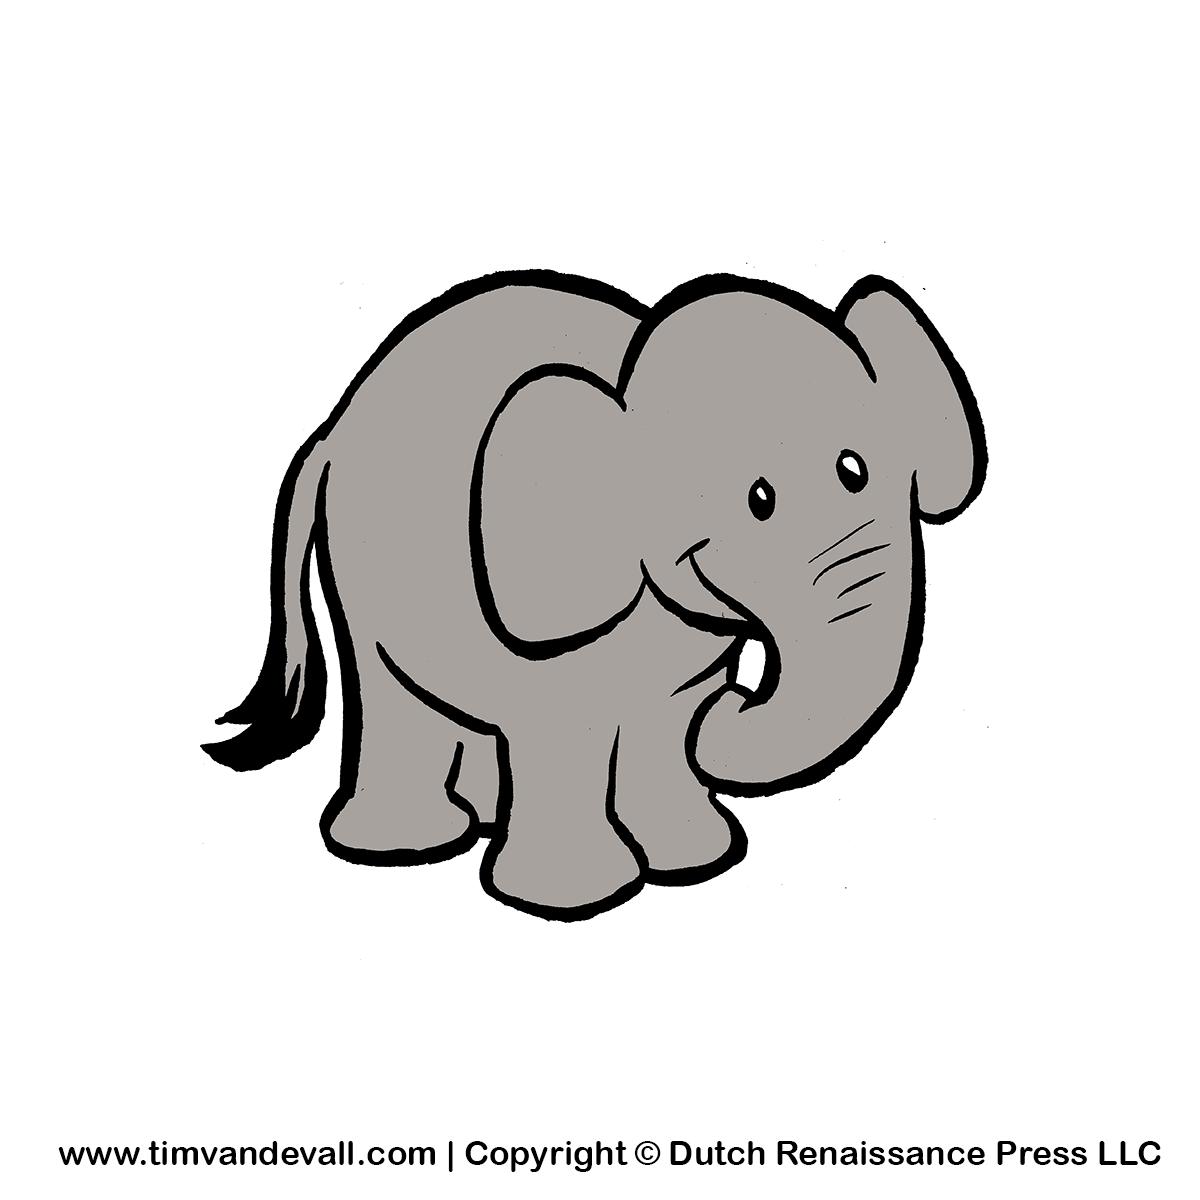 elephant clip art clipart panda free clipart images baby elephant clipart images elephant clip art images silhouette